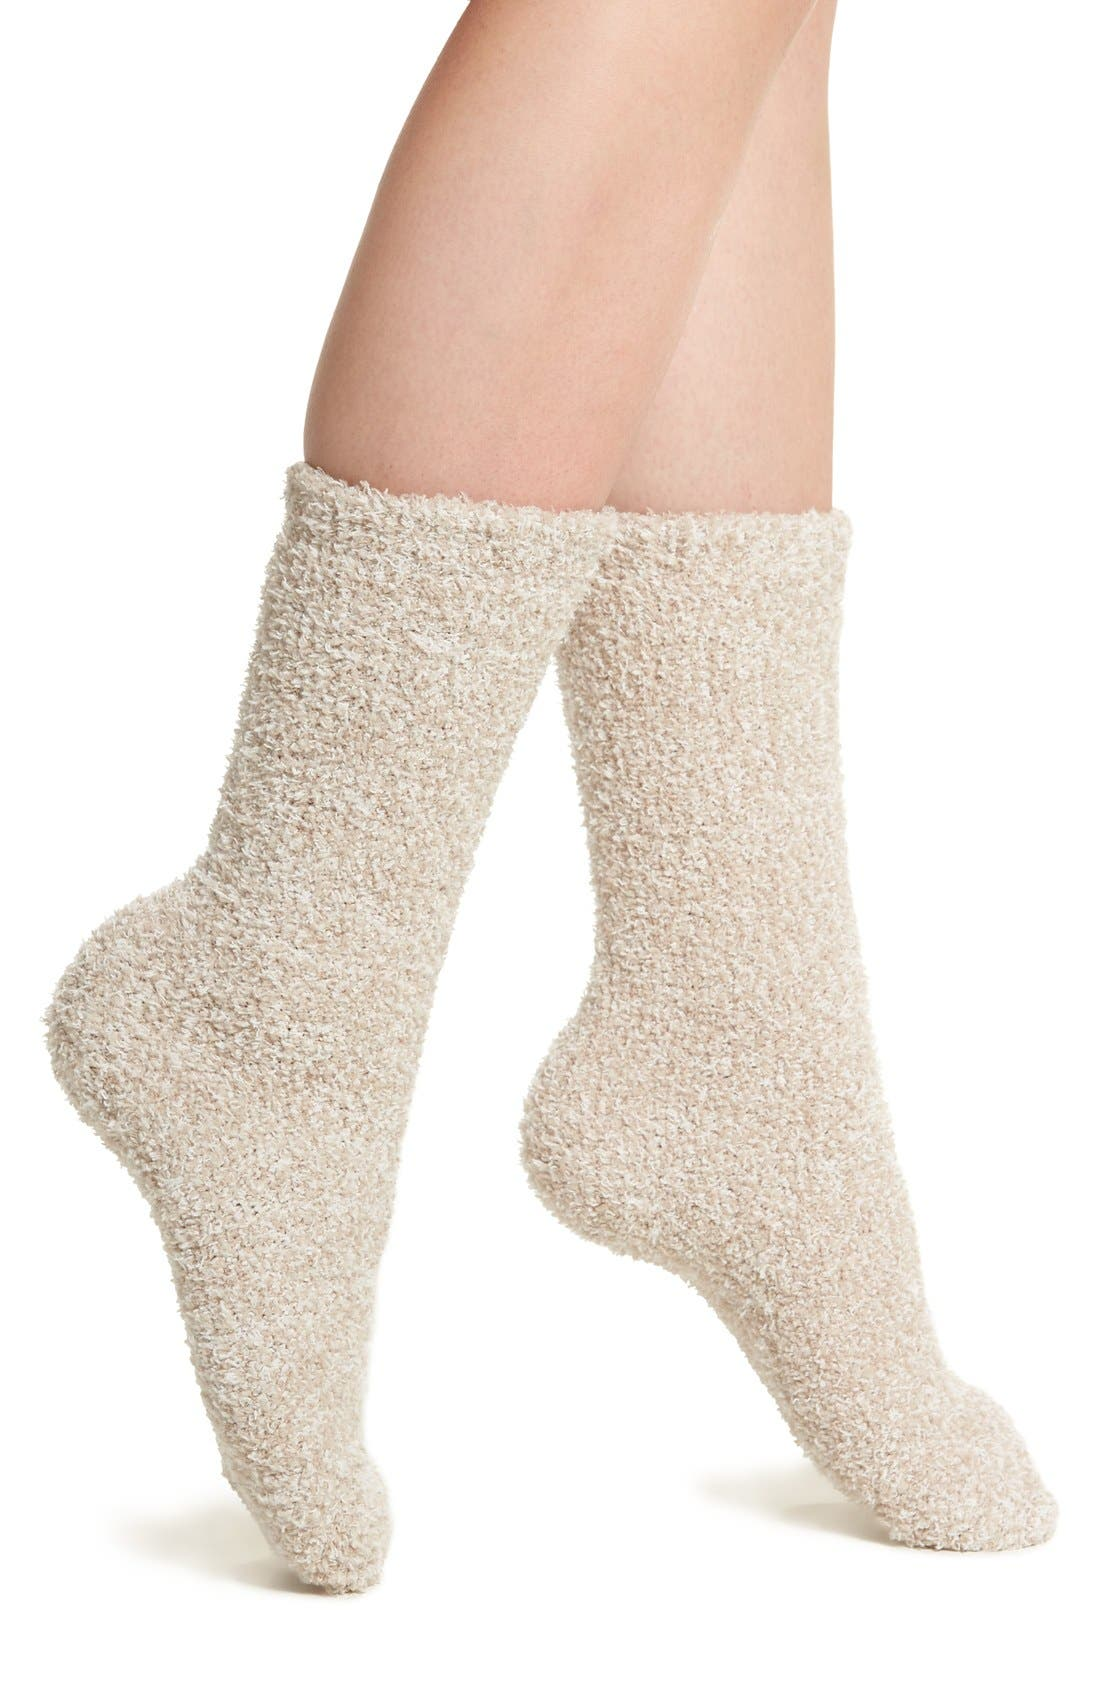 CozyChic<sup>®</sup> Socks,                         Main,                         color, STONE/ WHITE